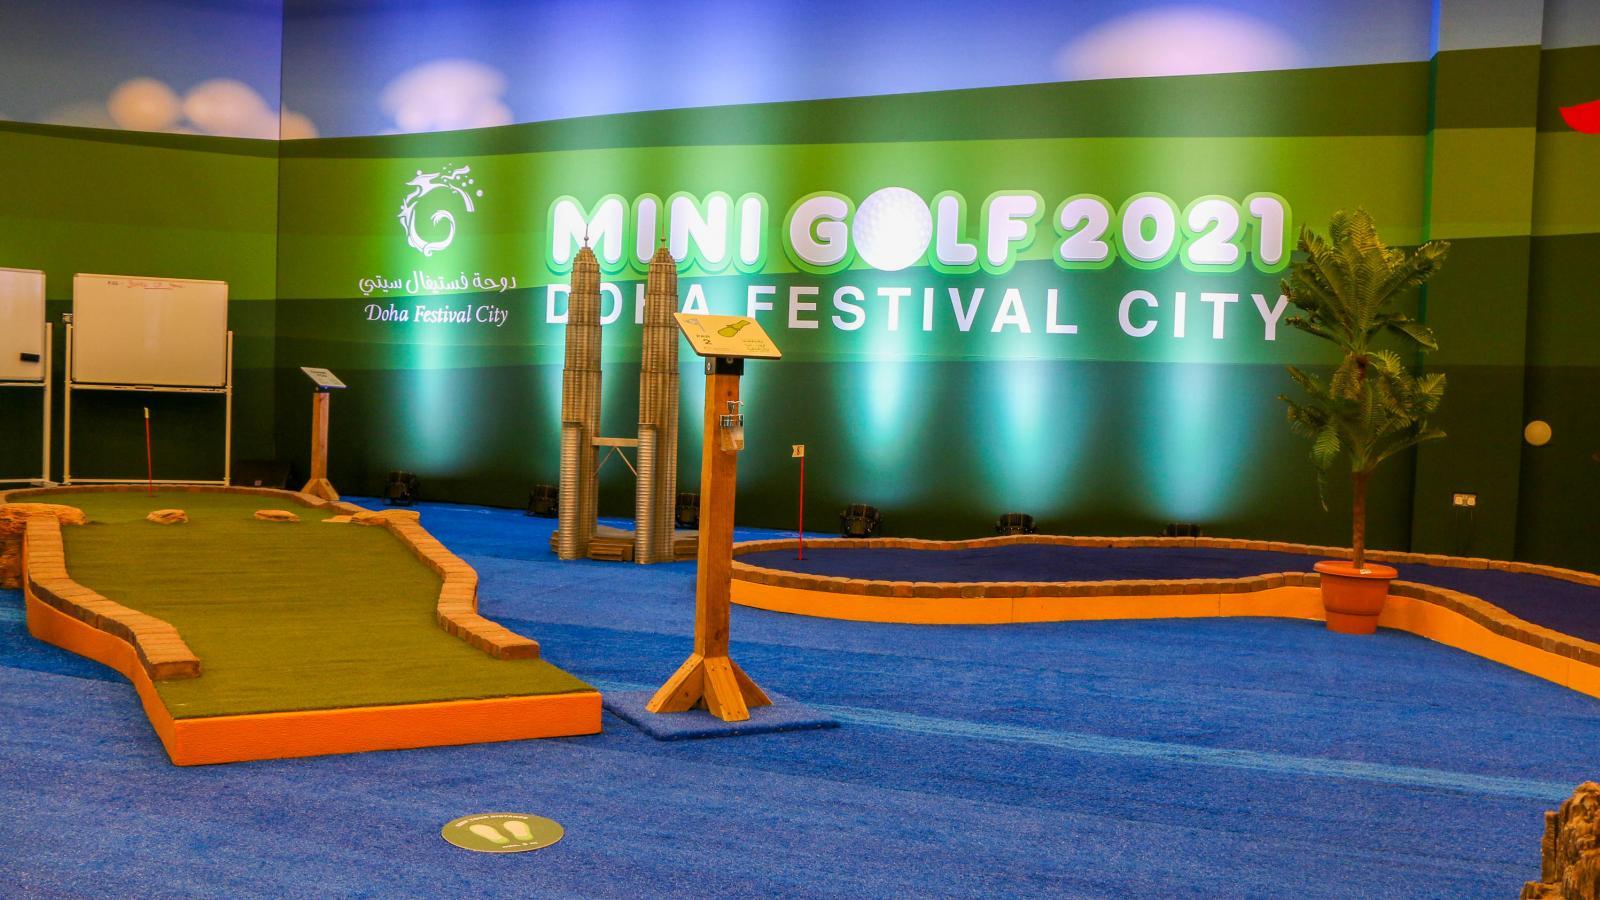 New mini golf experience opens at Doha Festival City